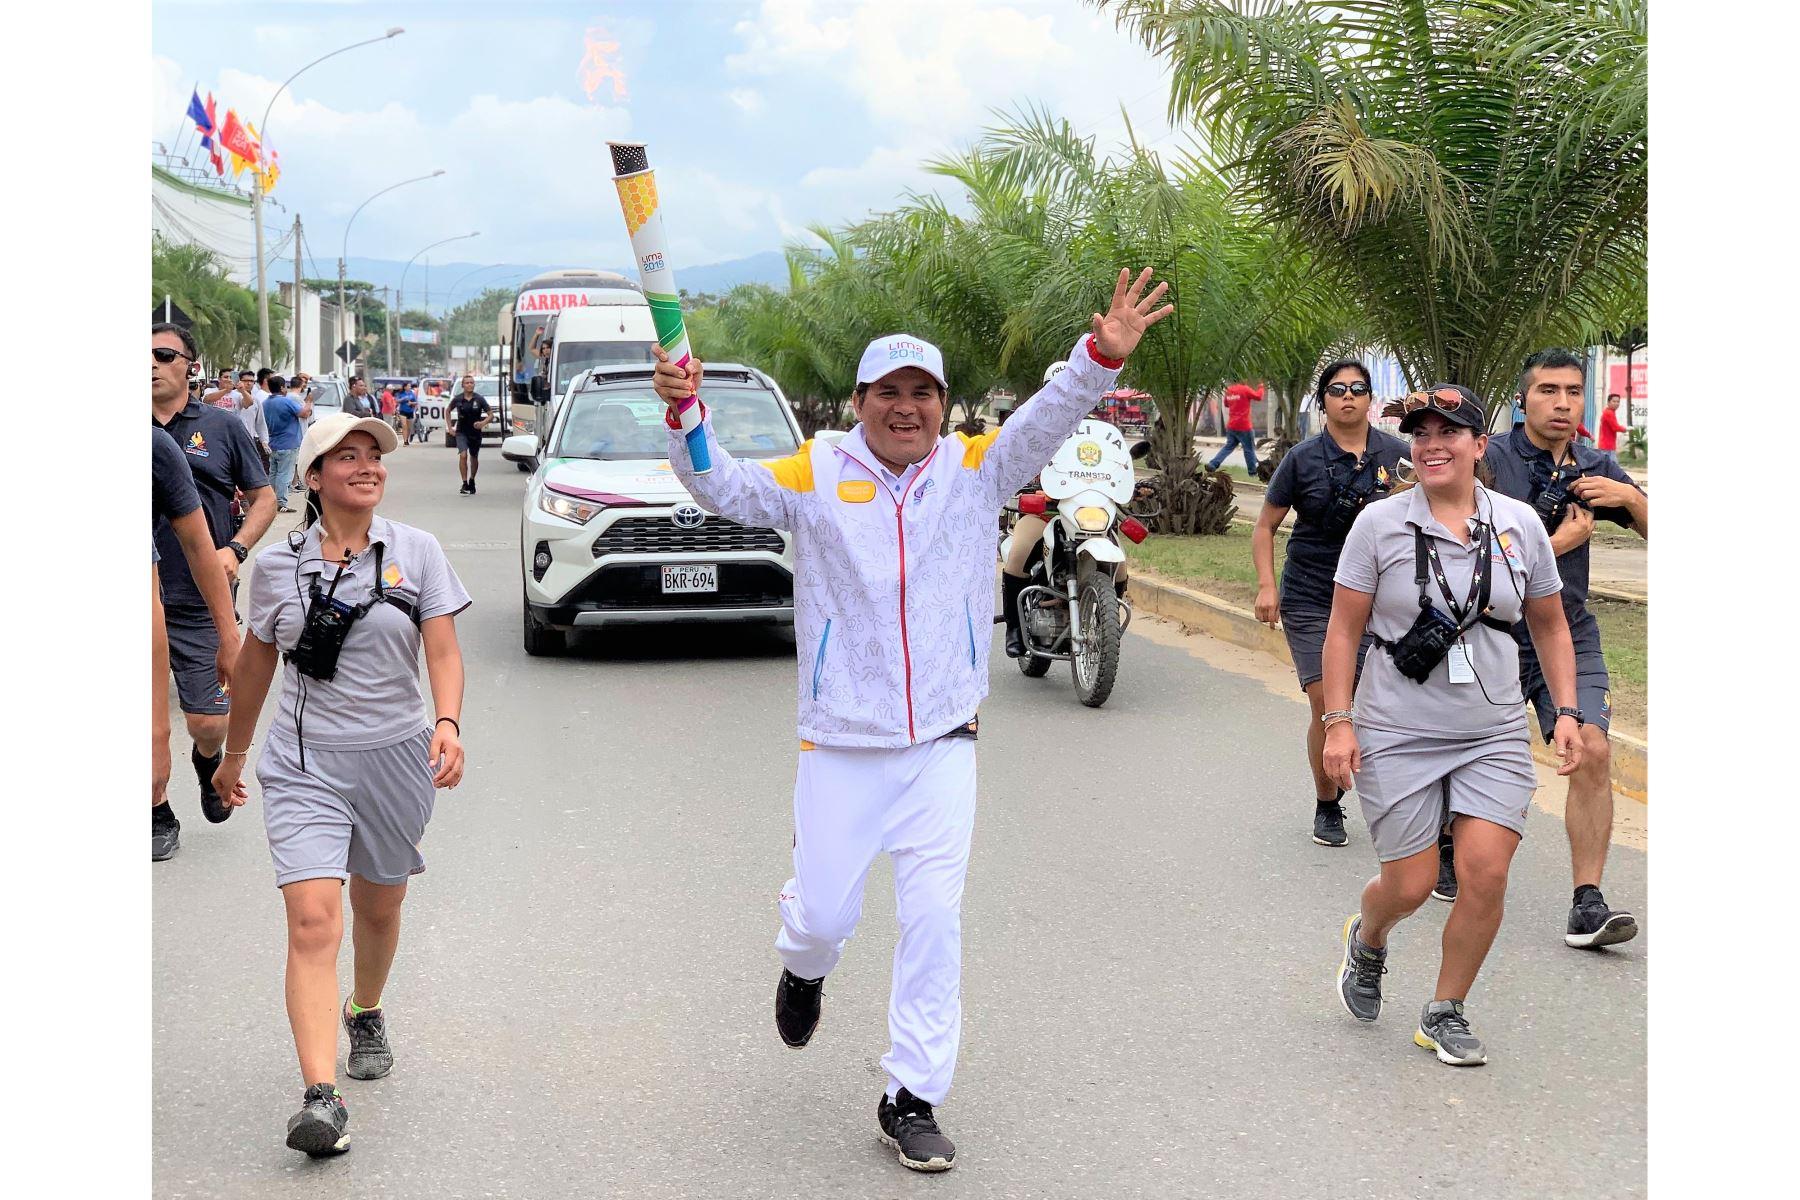 La Antorcha Panamericana llegó a Tarapoto - San Martín. Foto. Lima 2019